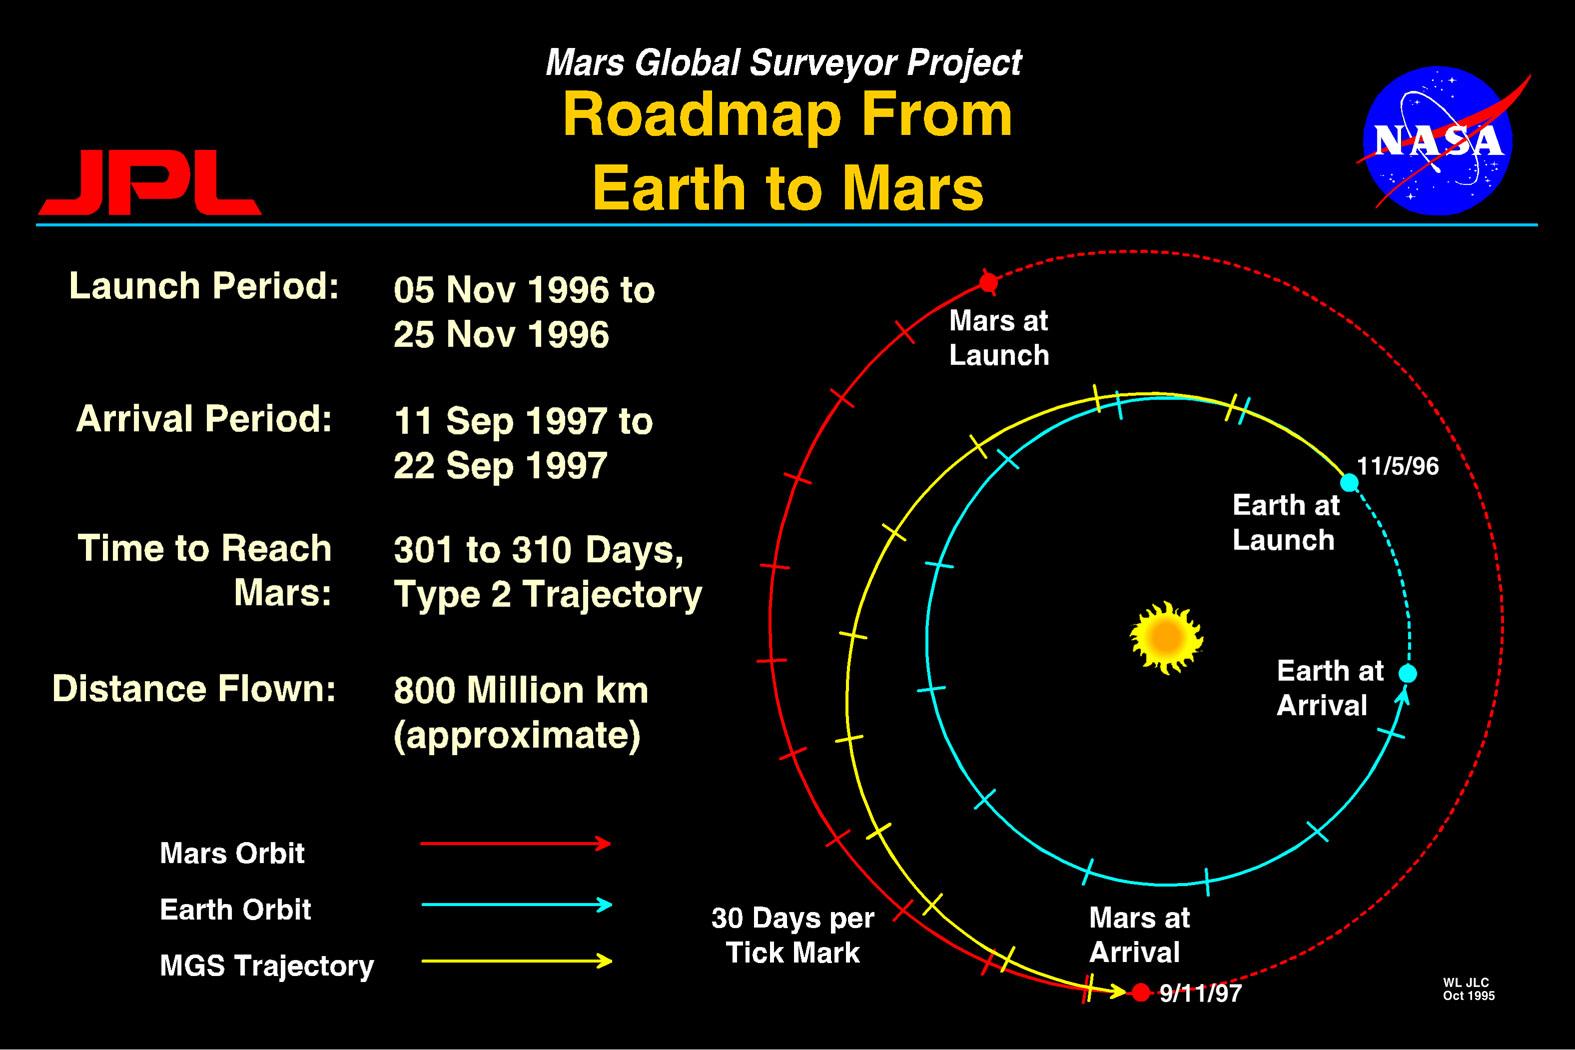 Orbital Mechanics: From Earth to Mars